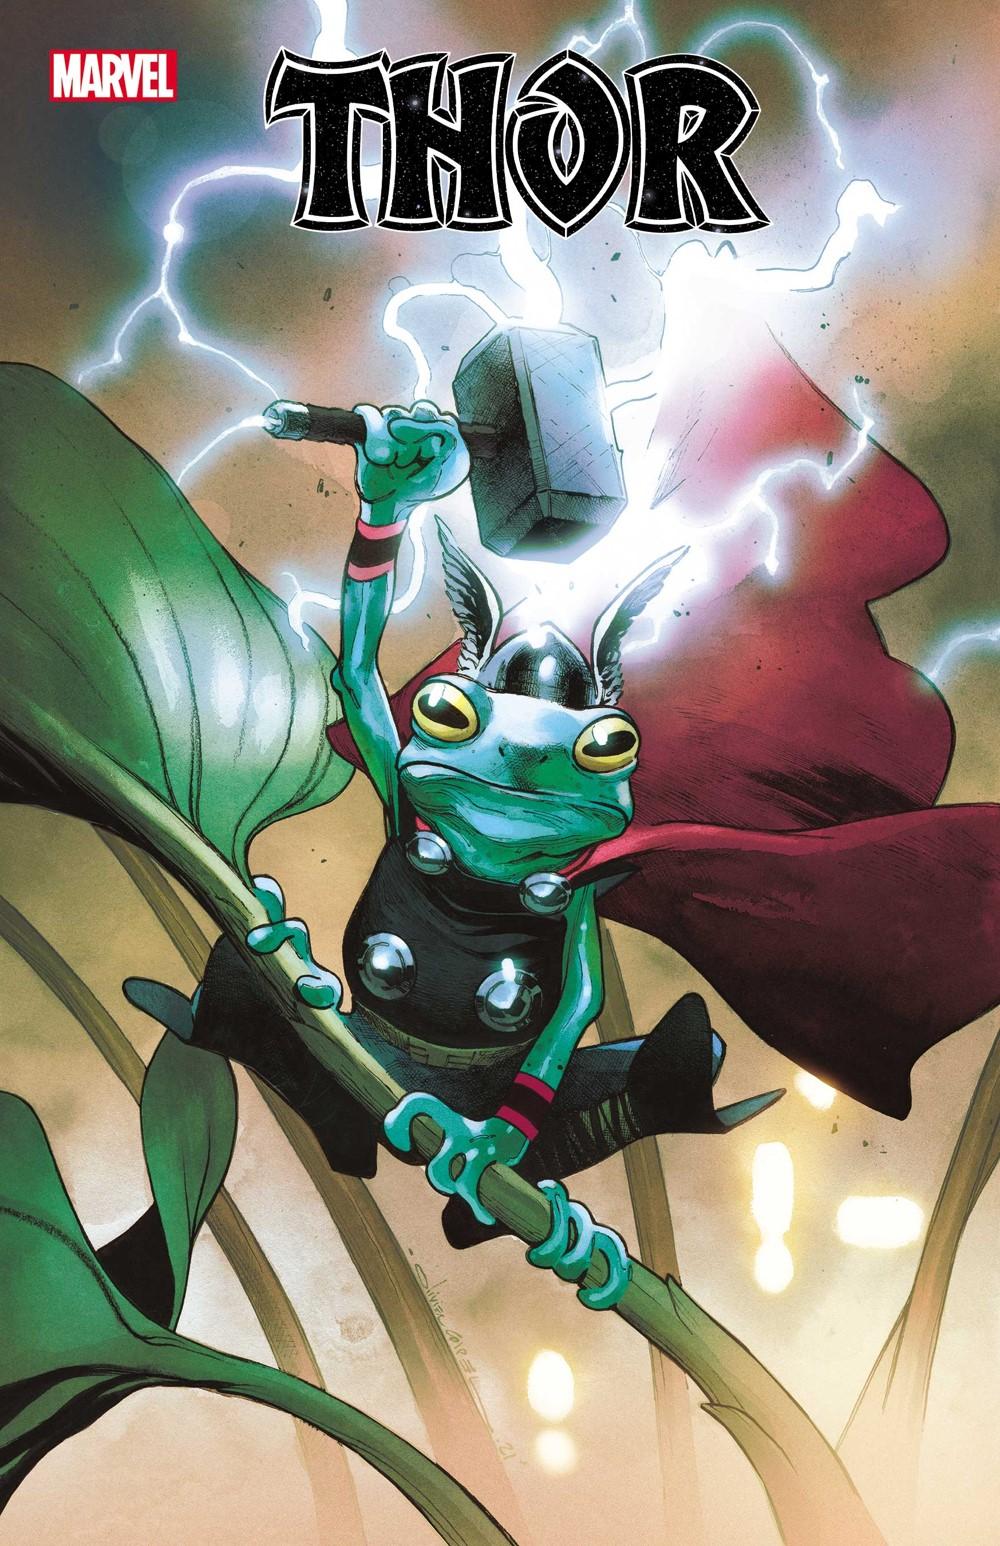 THOR2020018_cvr Marvel Comics October 2021 Solicitations